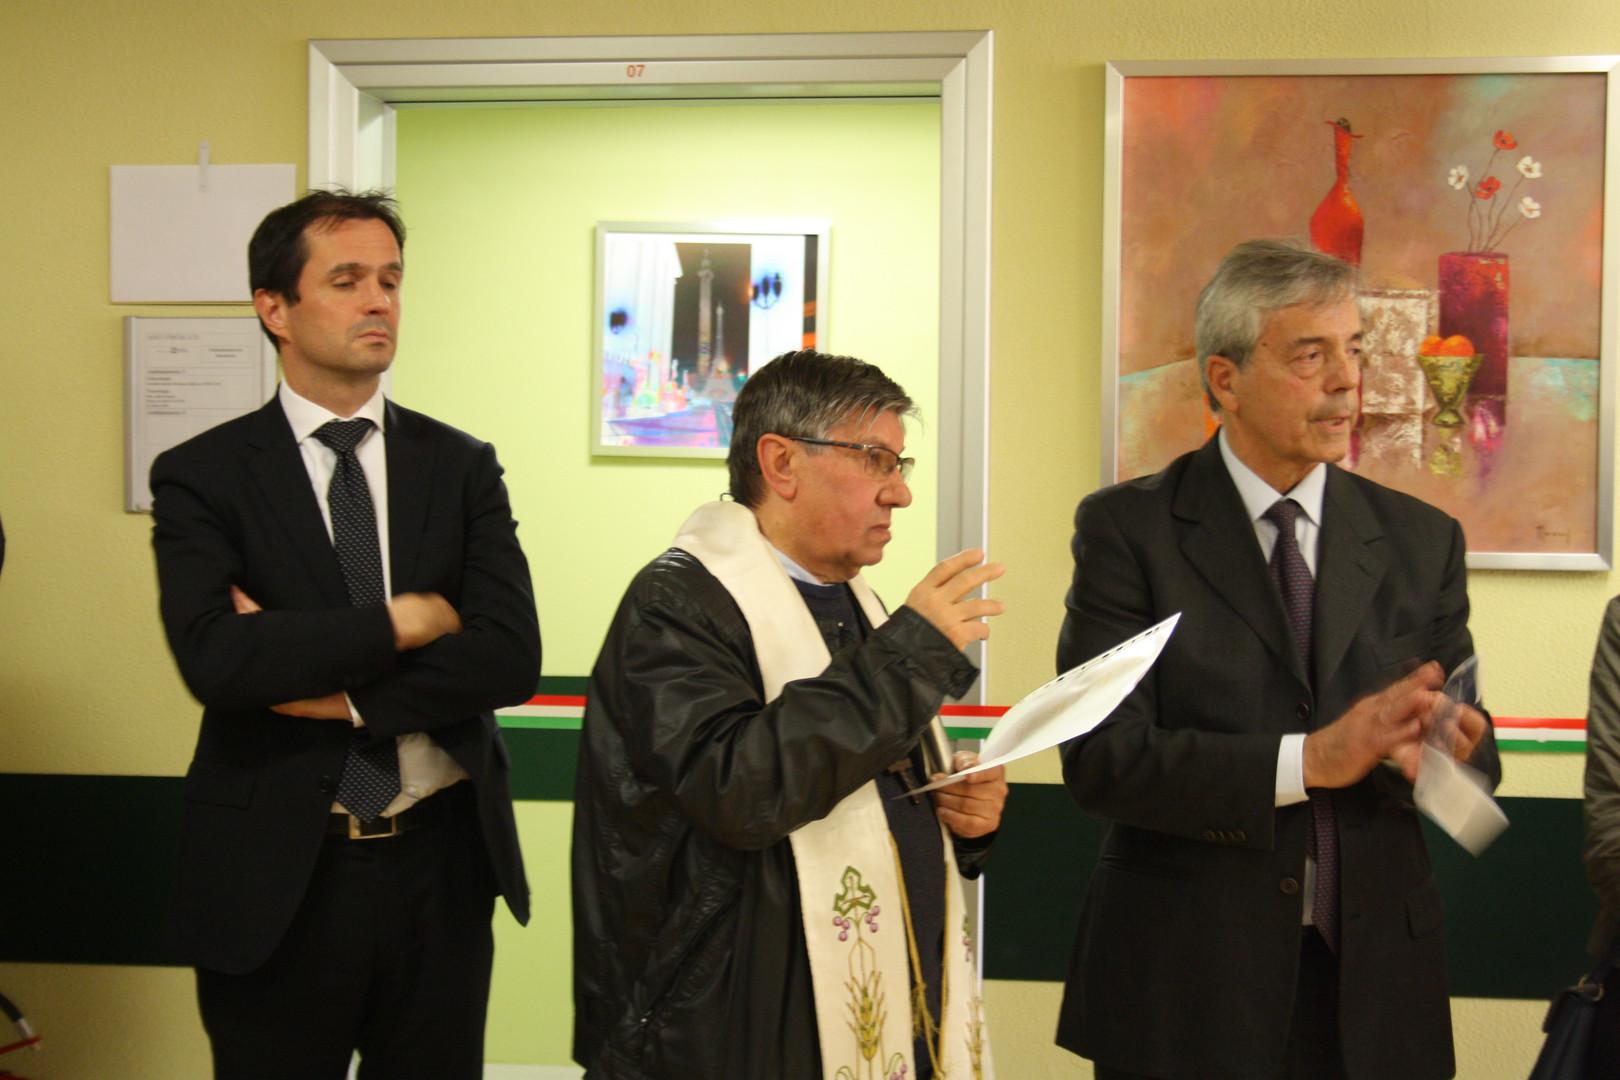 CDS Inaugurazione PS Macherio 038.JPG